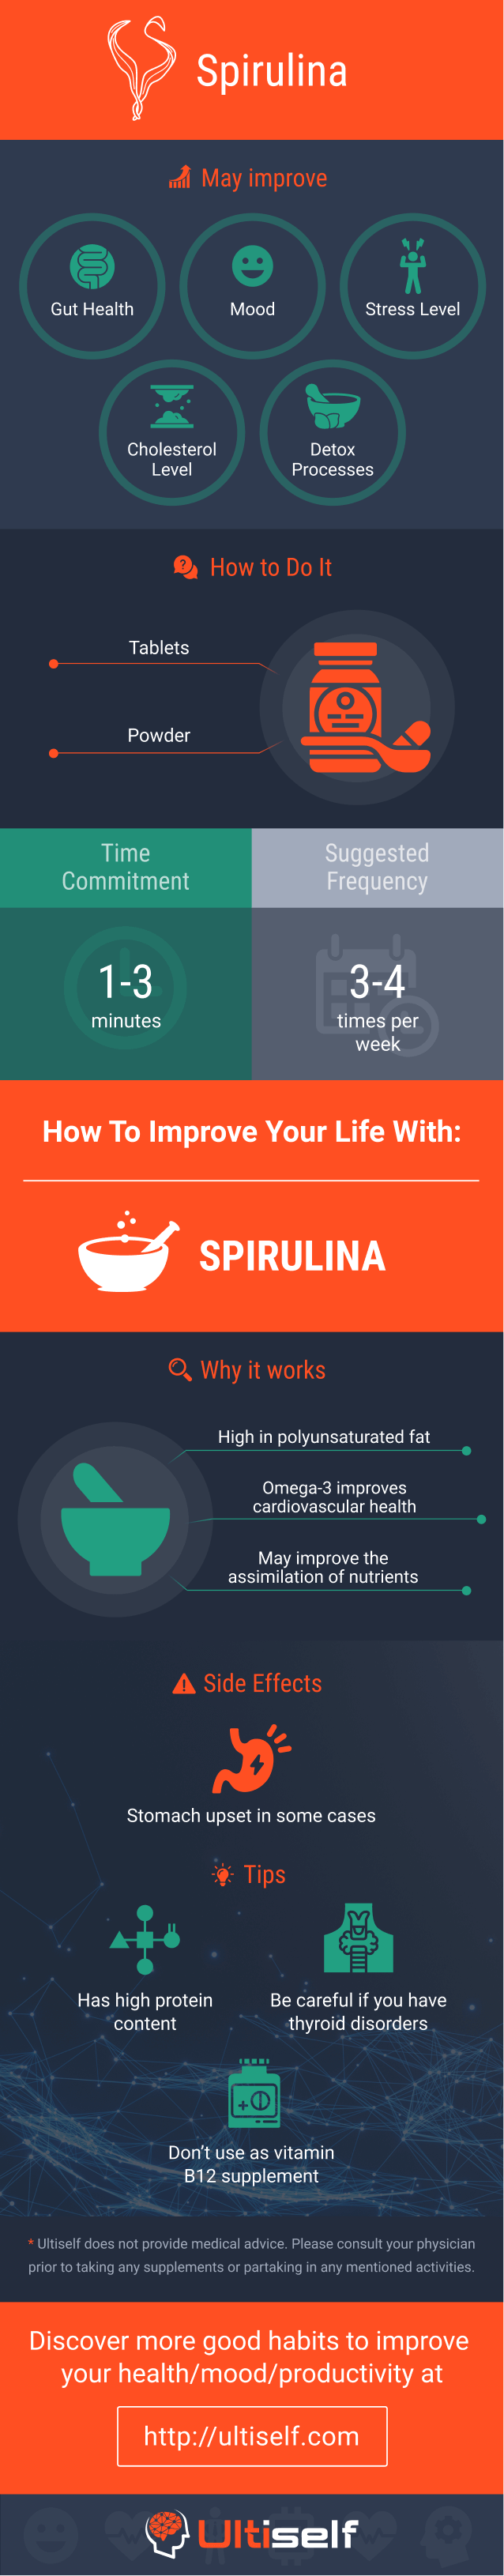 Spirulina infographic